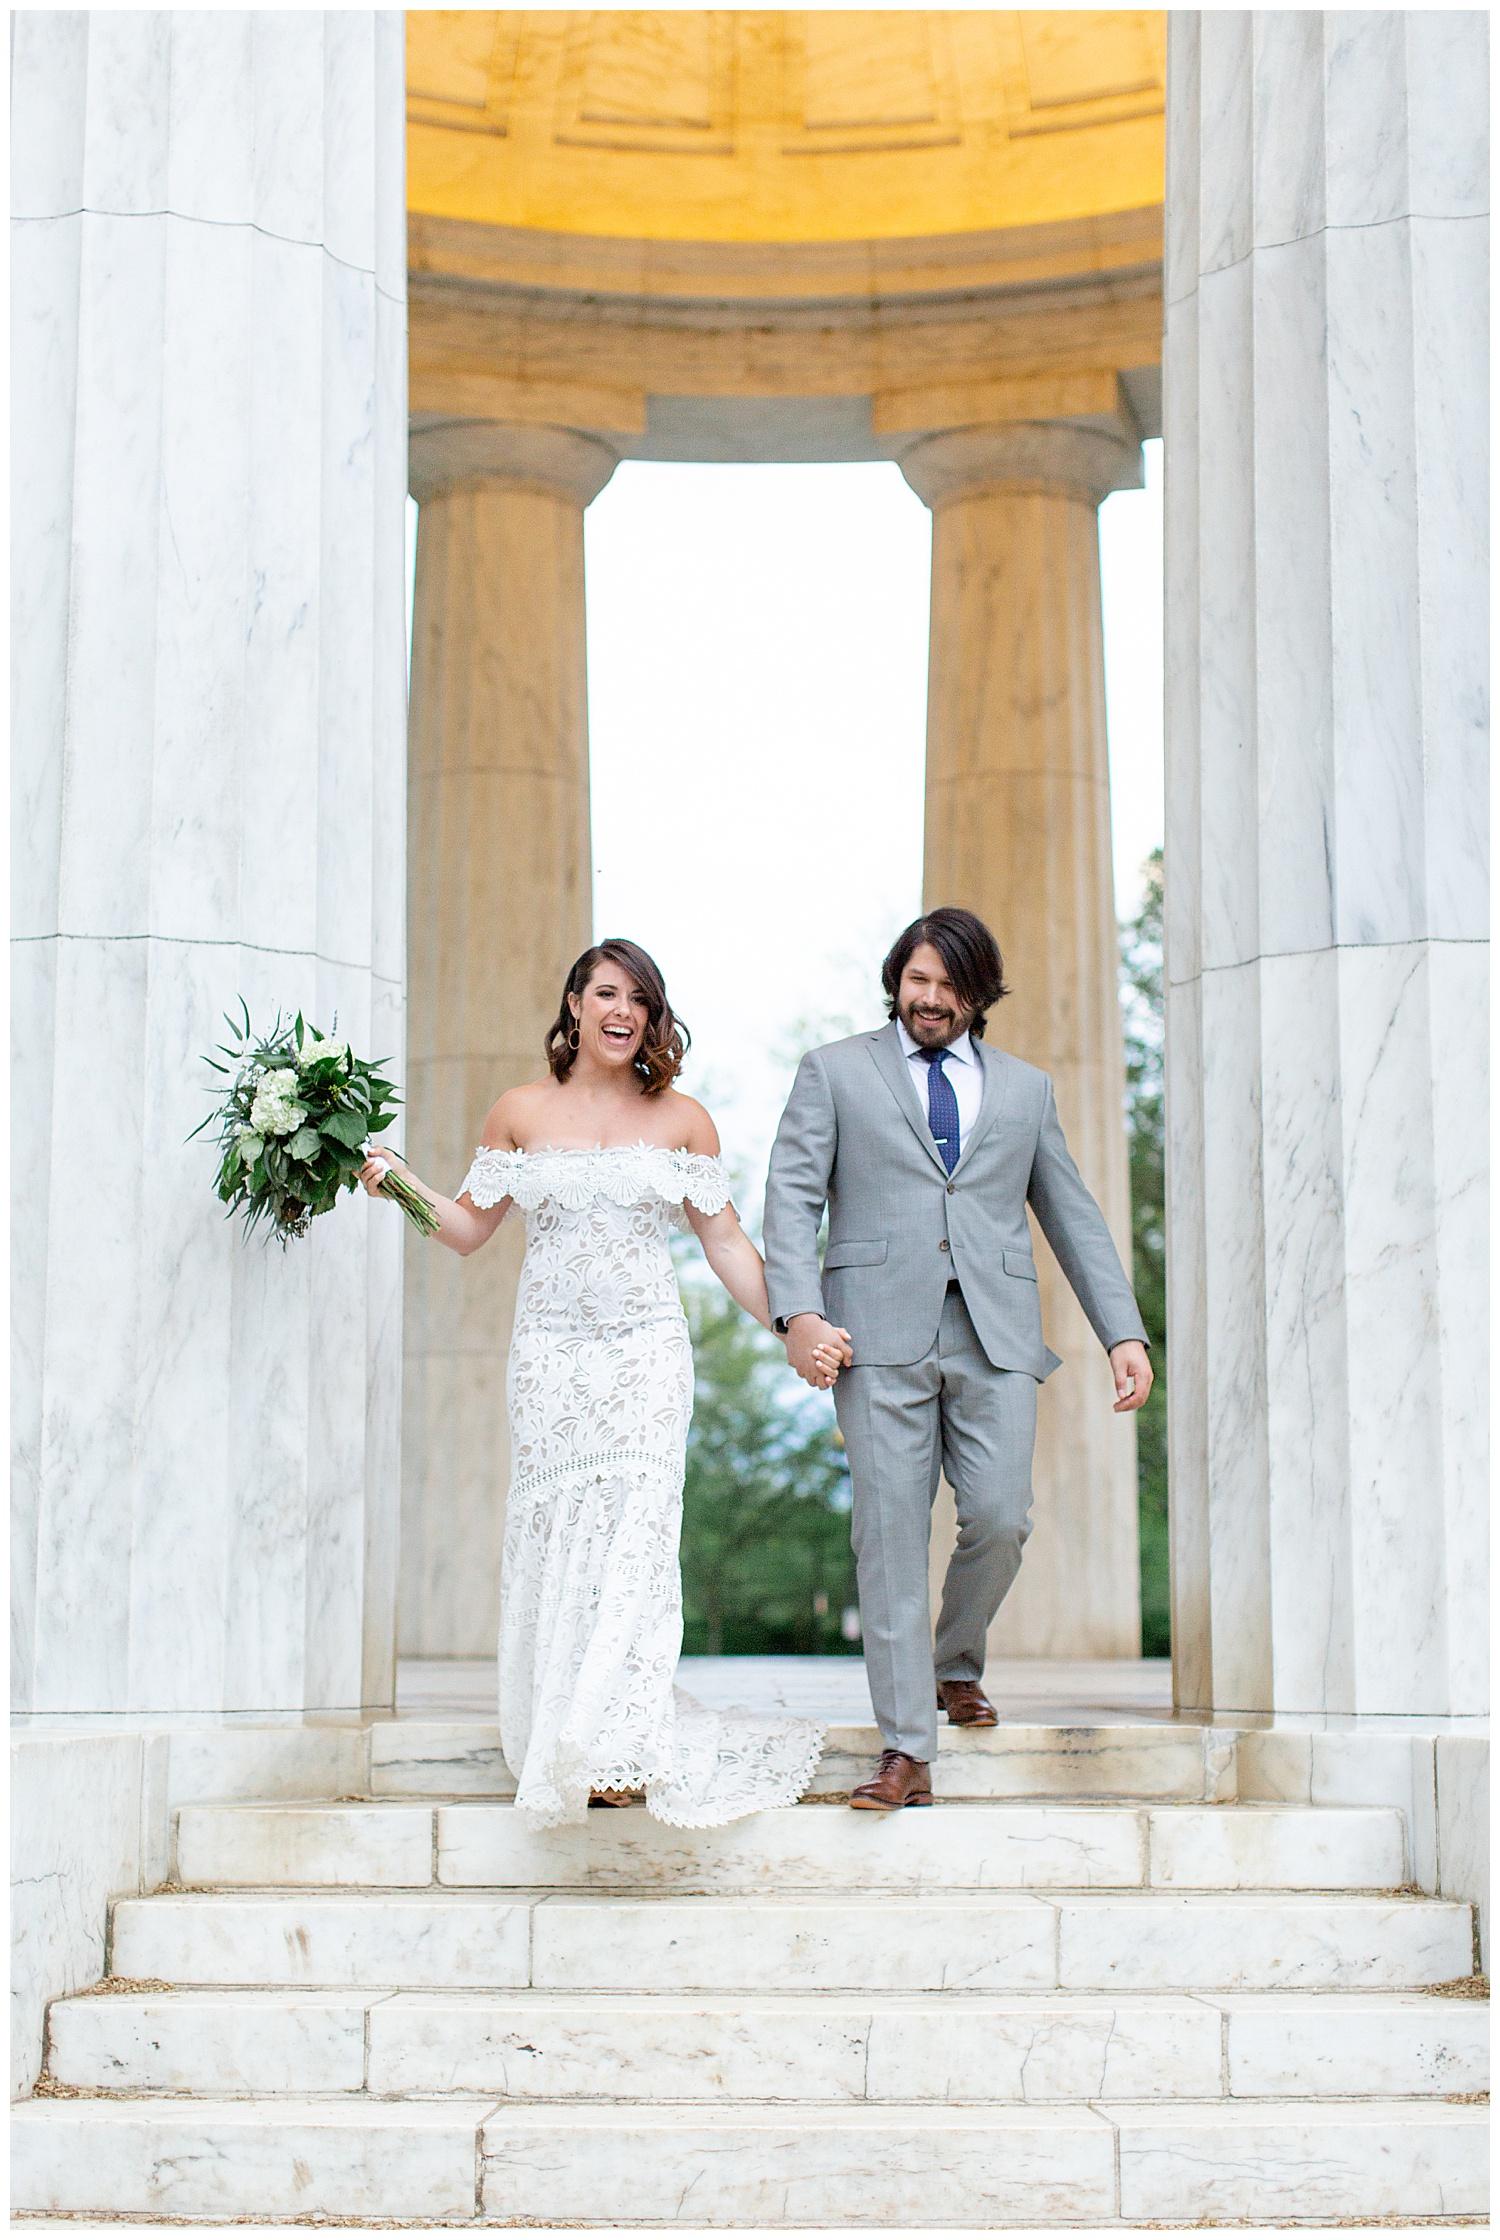 emily-belson-photography-washington-dc-wedding-22.jpg